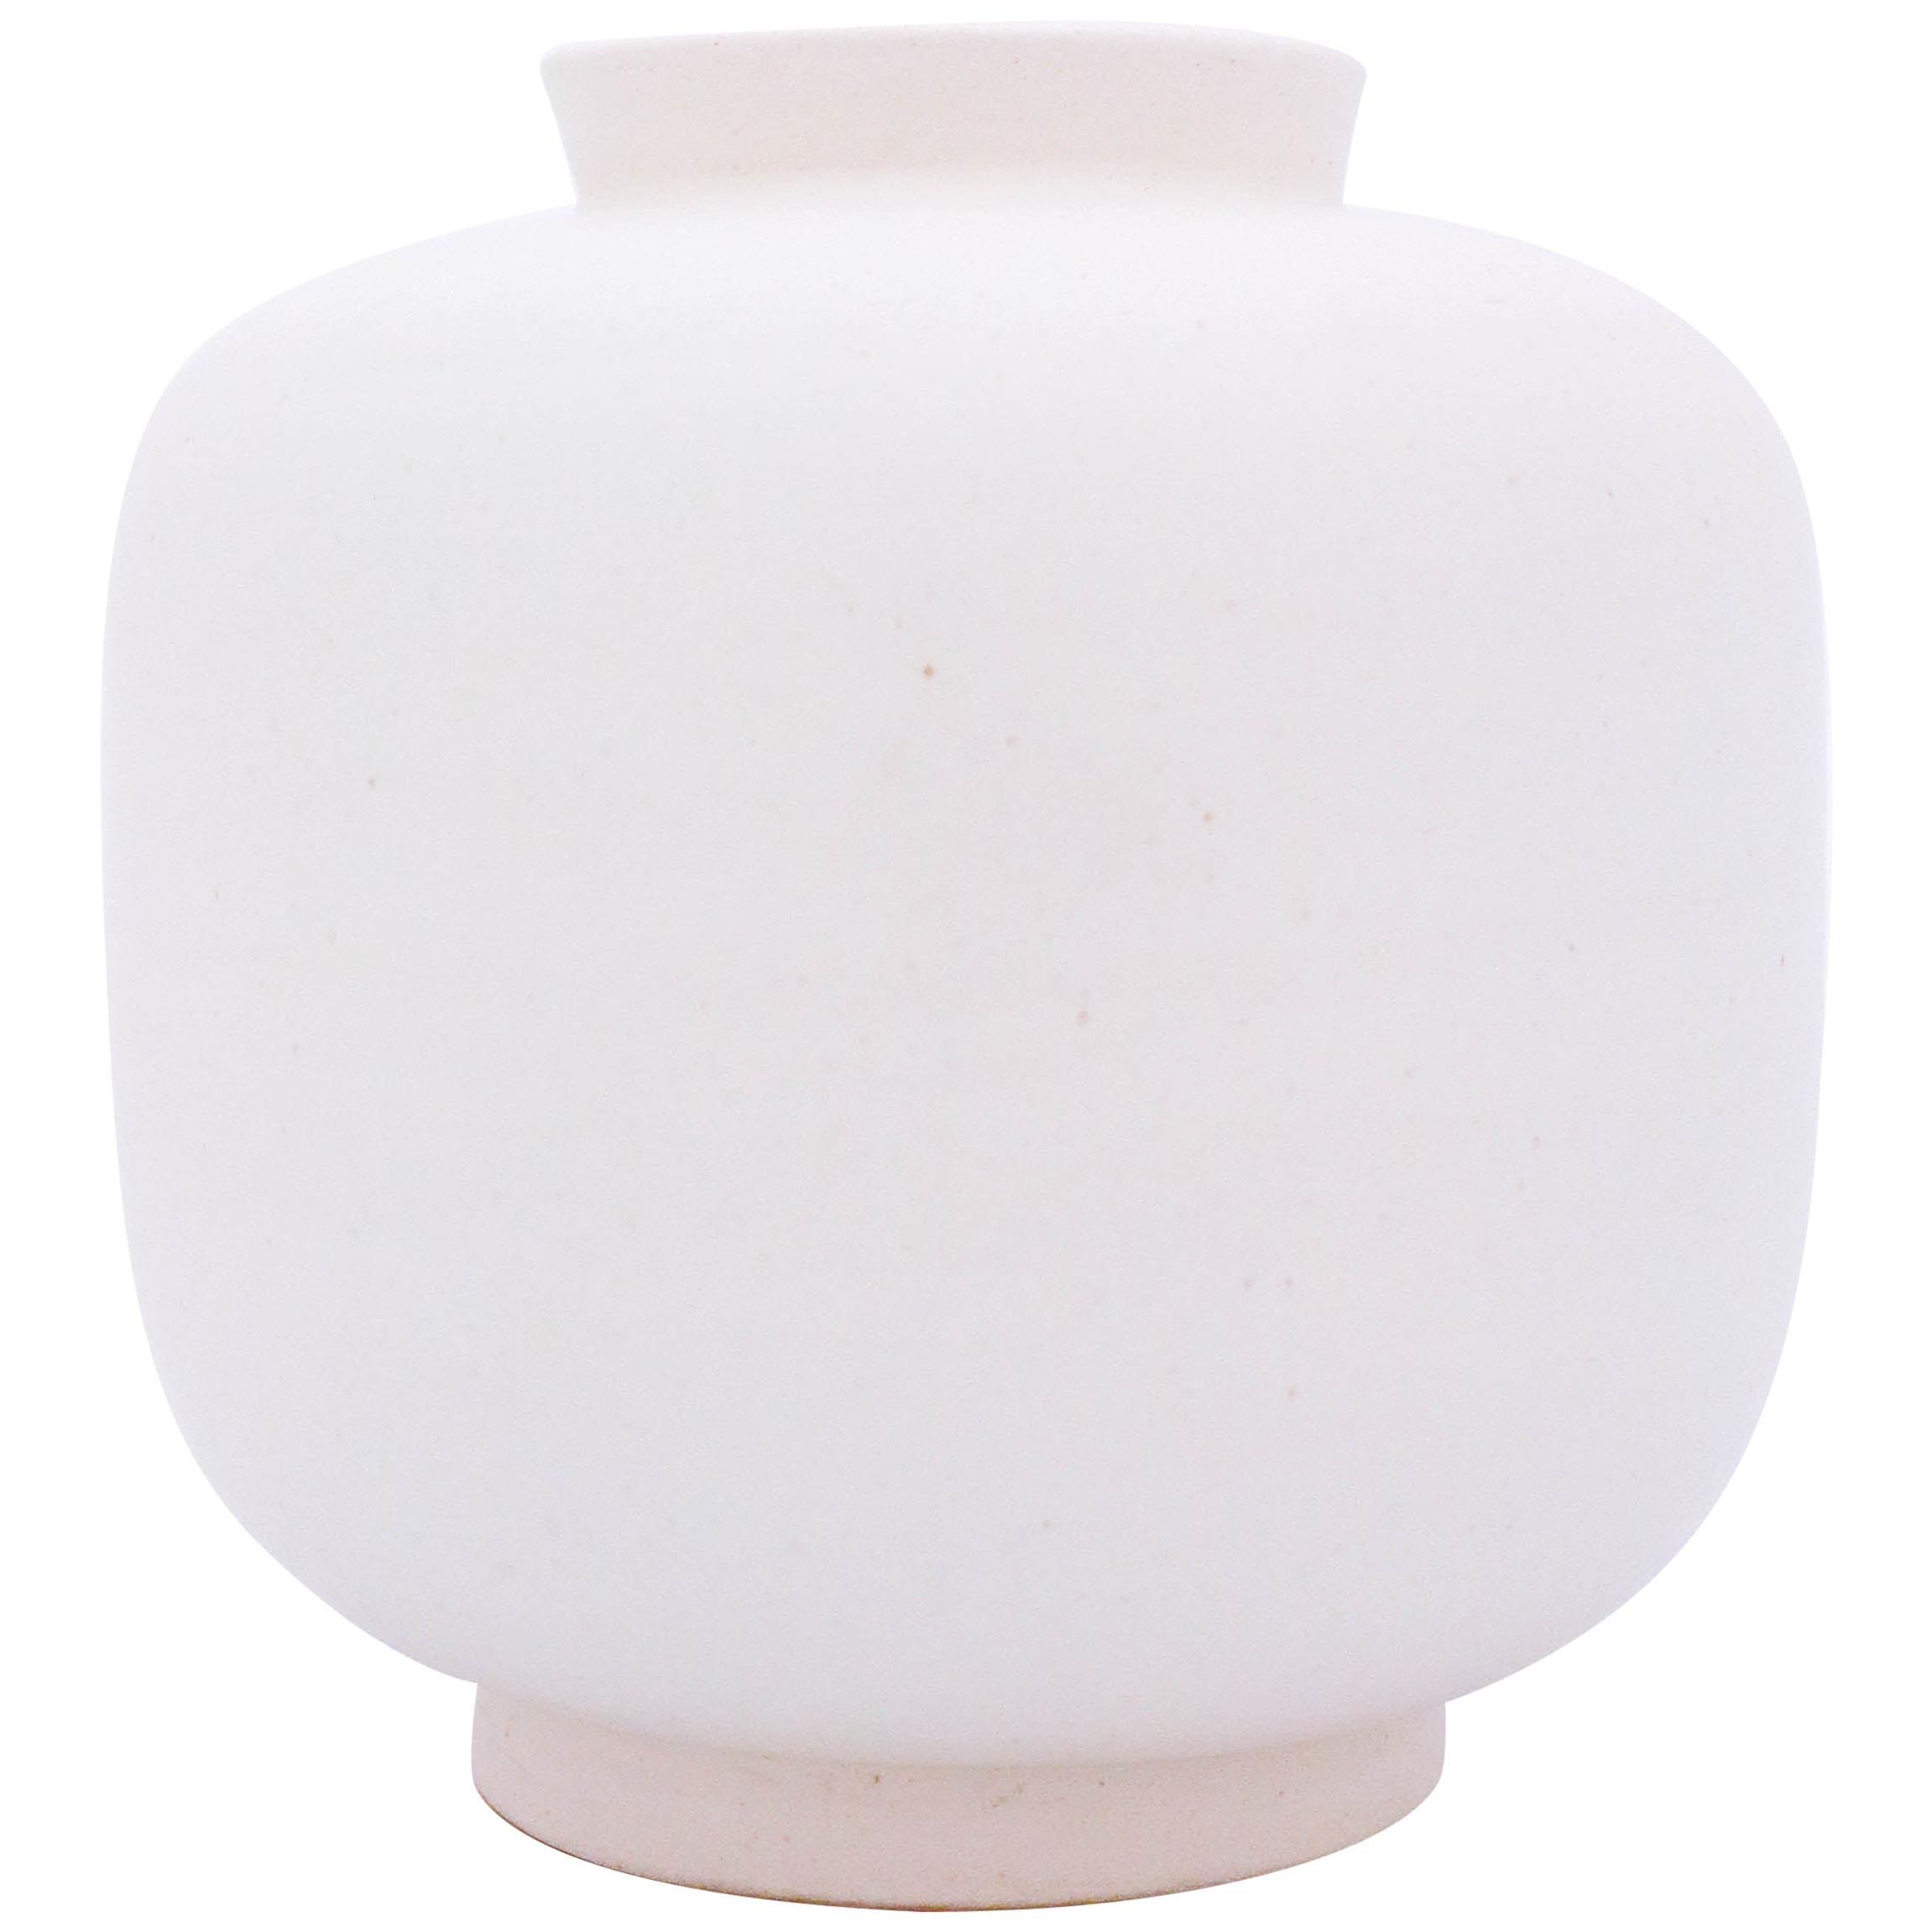 White Midcentury Vase, Carrara 1132, Wilhelm Kåge Gustavsberg